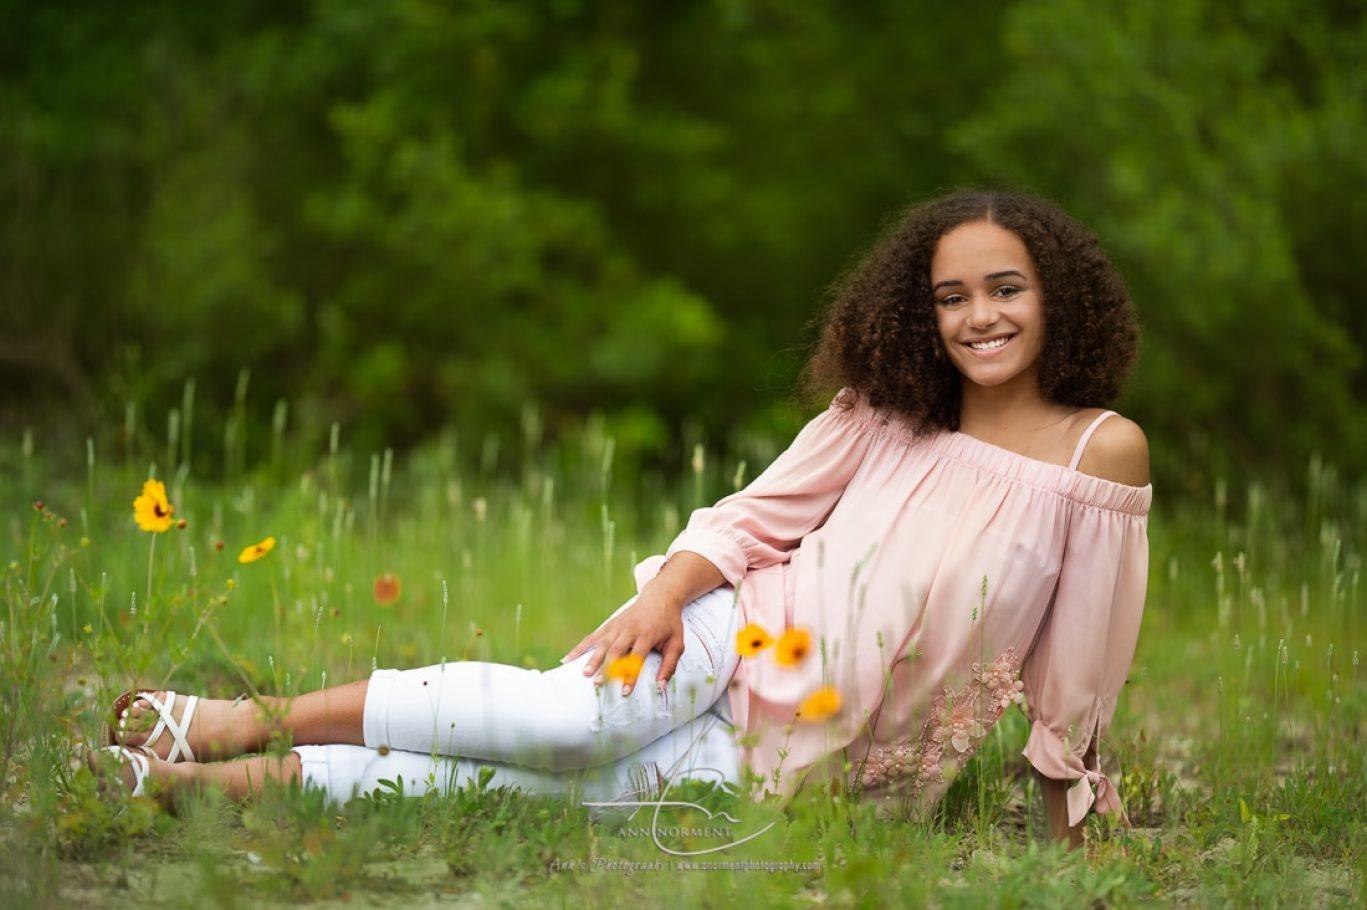 Senior Portraits, Senior Pictures, Photographer, Fort Mill SC, Lake Wylie SC, Rock Hill SC, Indian Land SC, Lancaster SC, Ballantyne NC, Waxhaw NC, Charlotte NC, Weddington NC